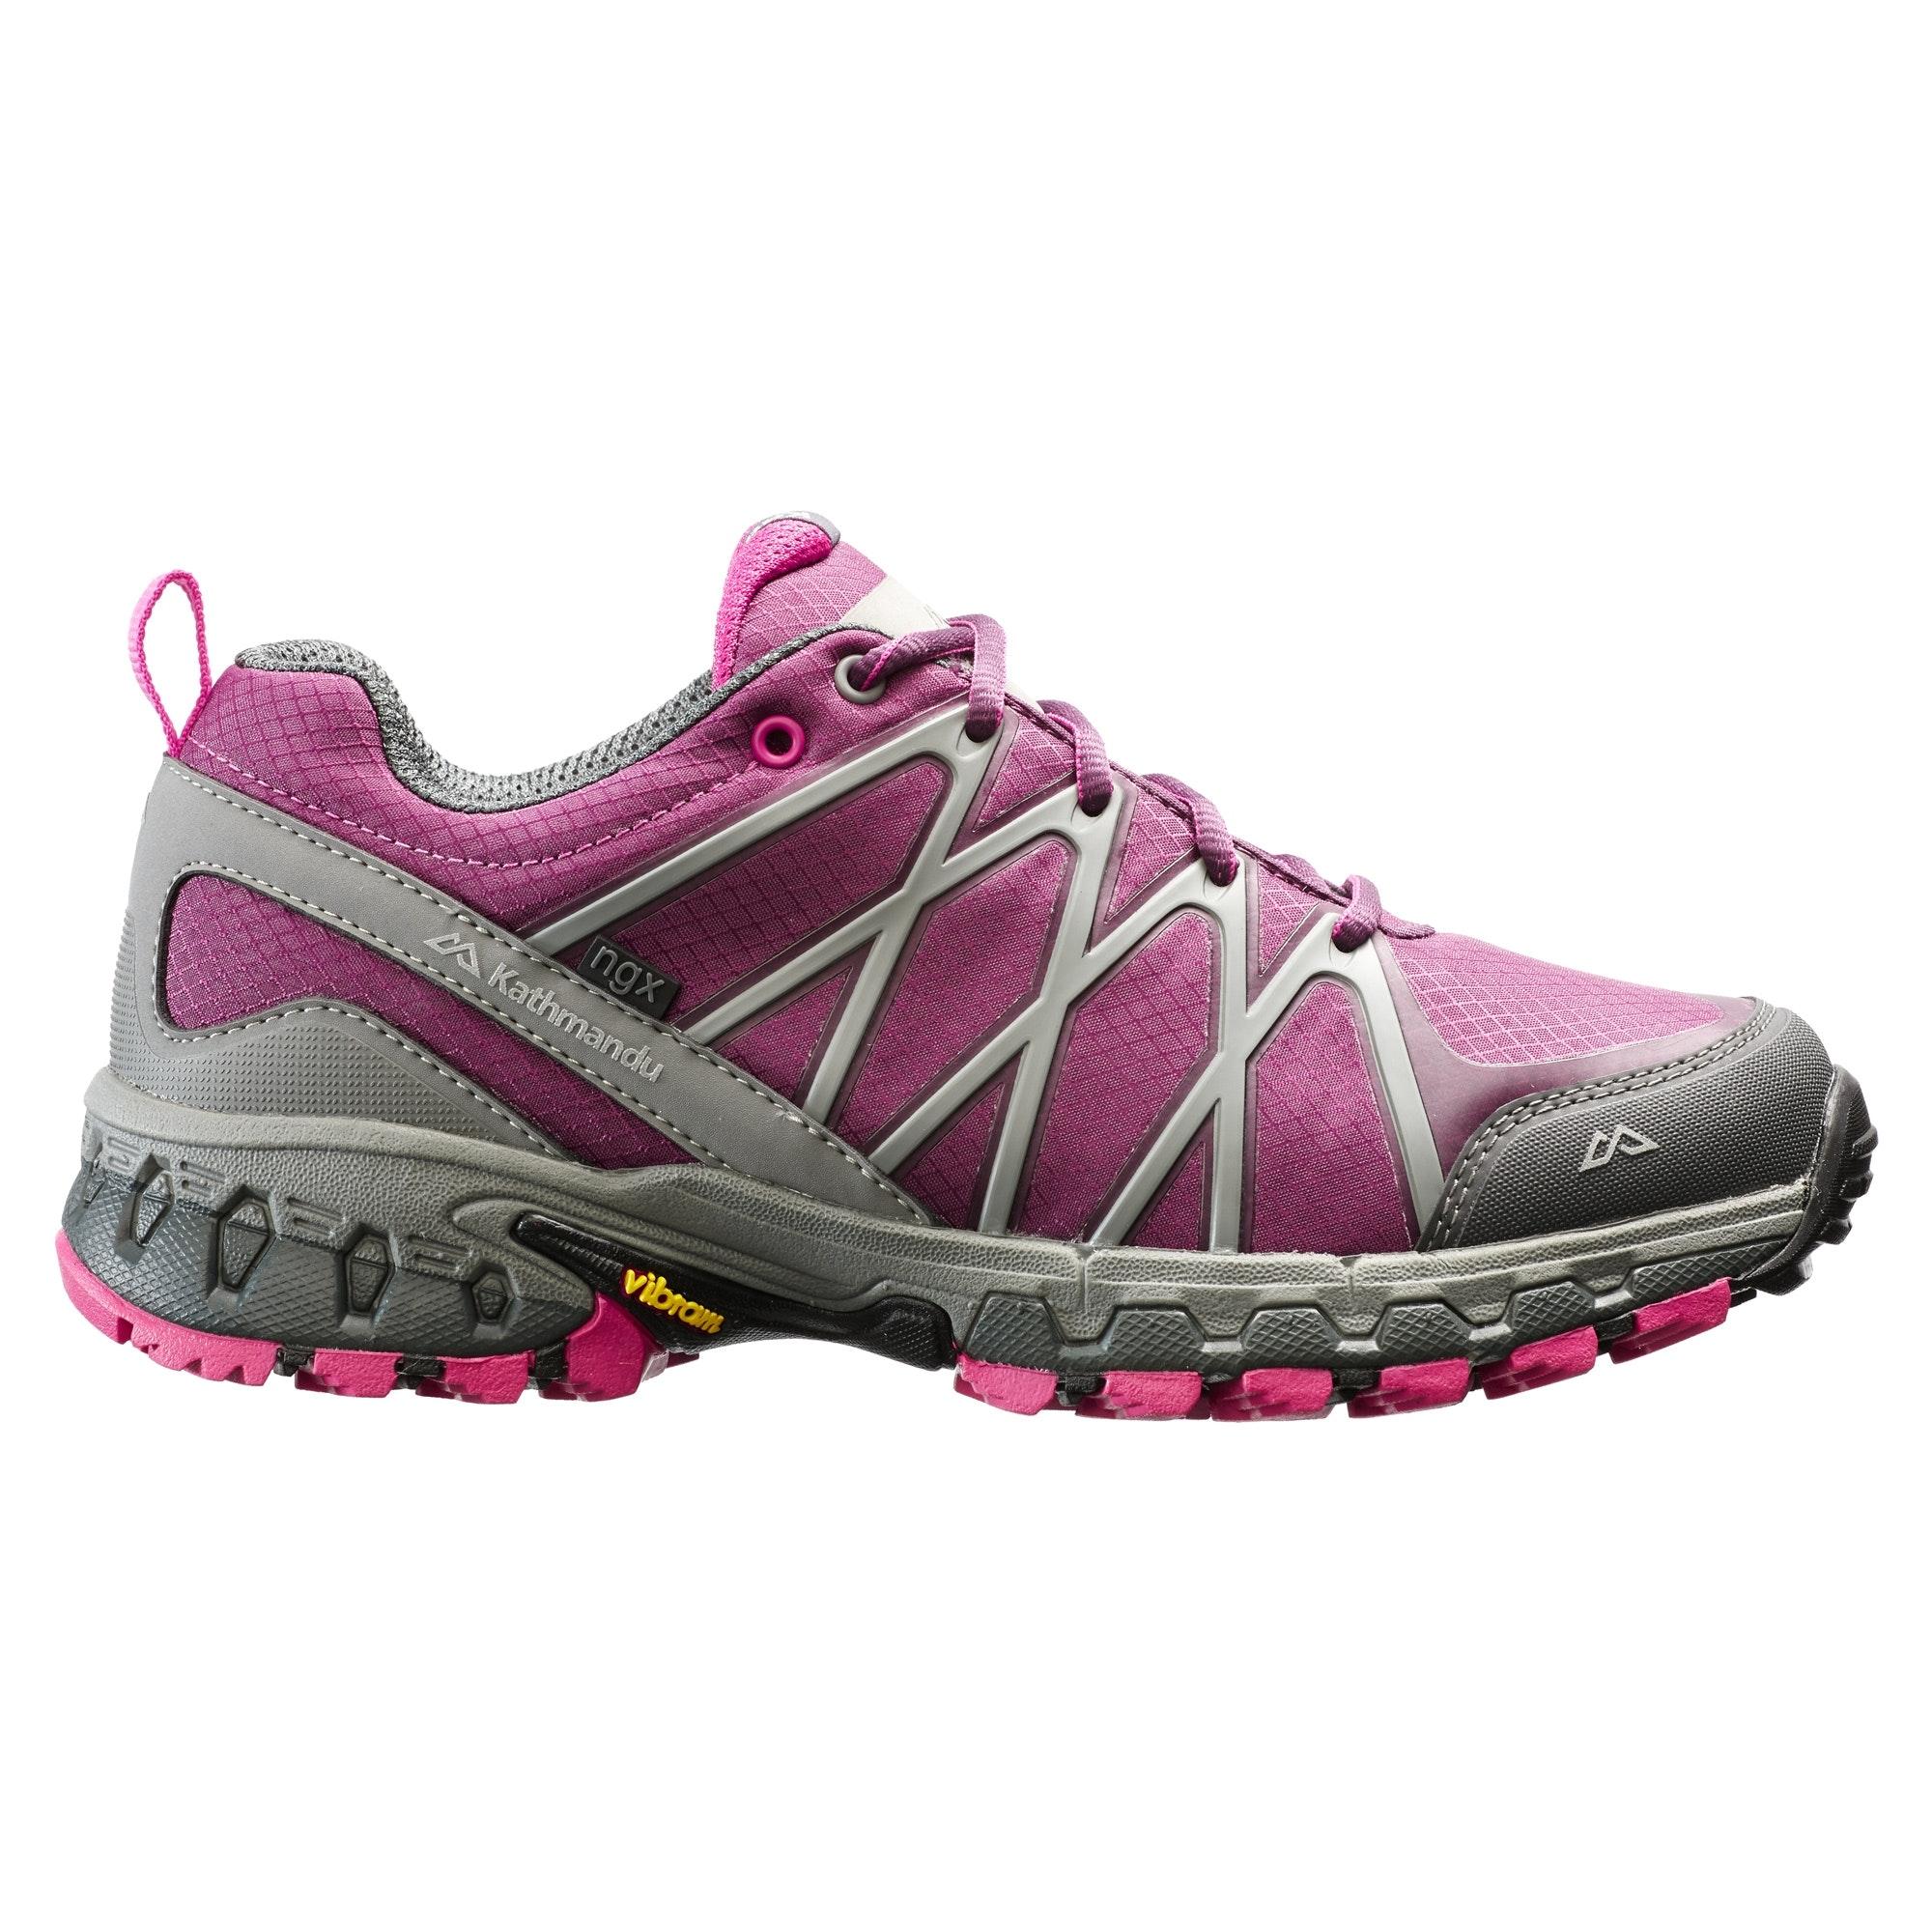 daaf5cf75b1 Savour more of the outdoors. The Fletcher II NGX Trail Women s shoe ...